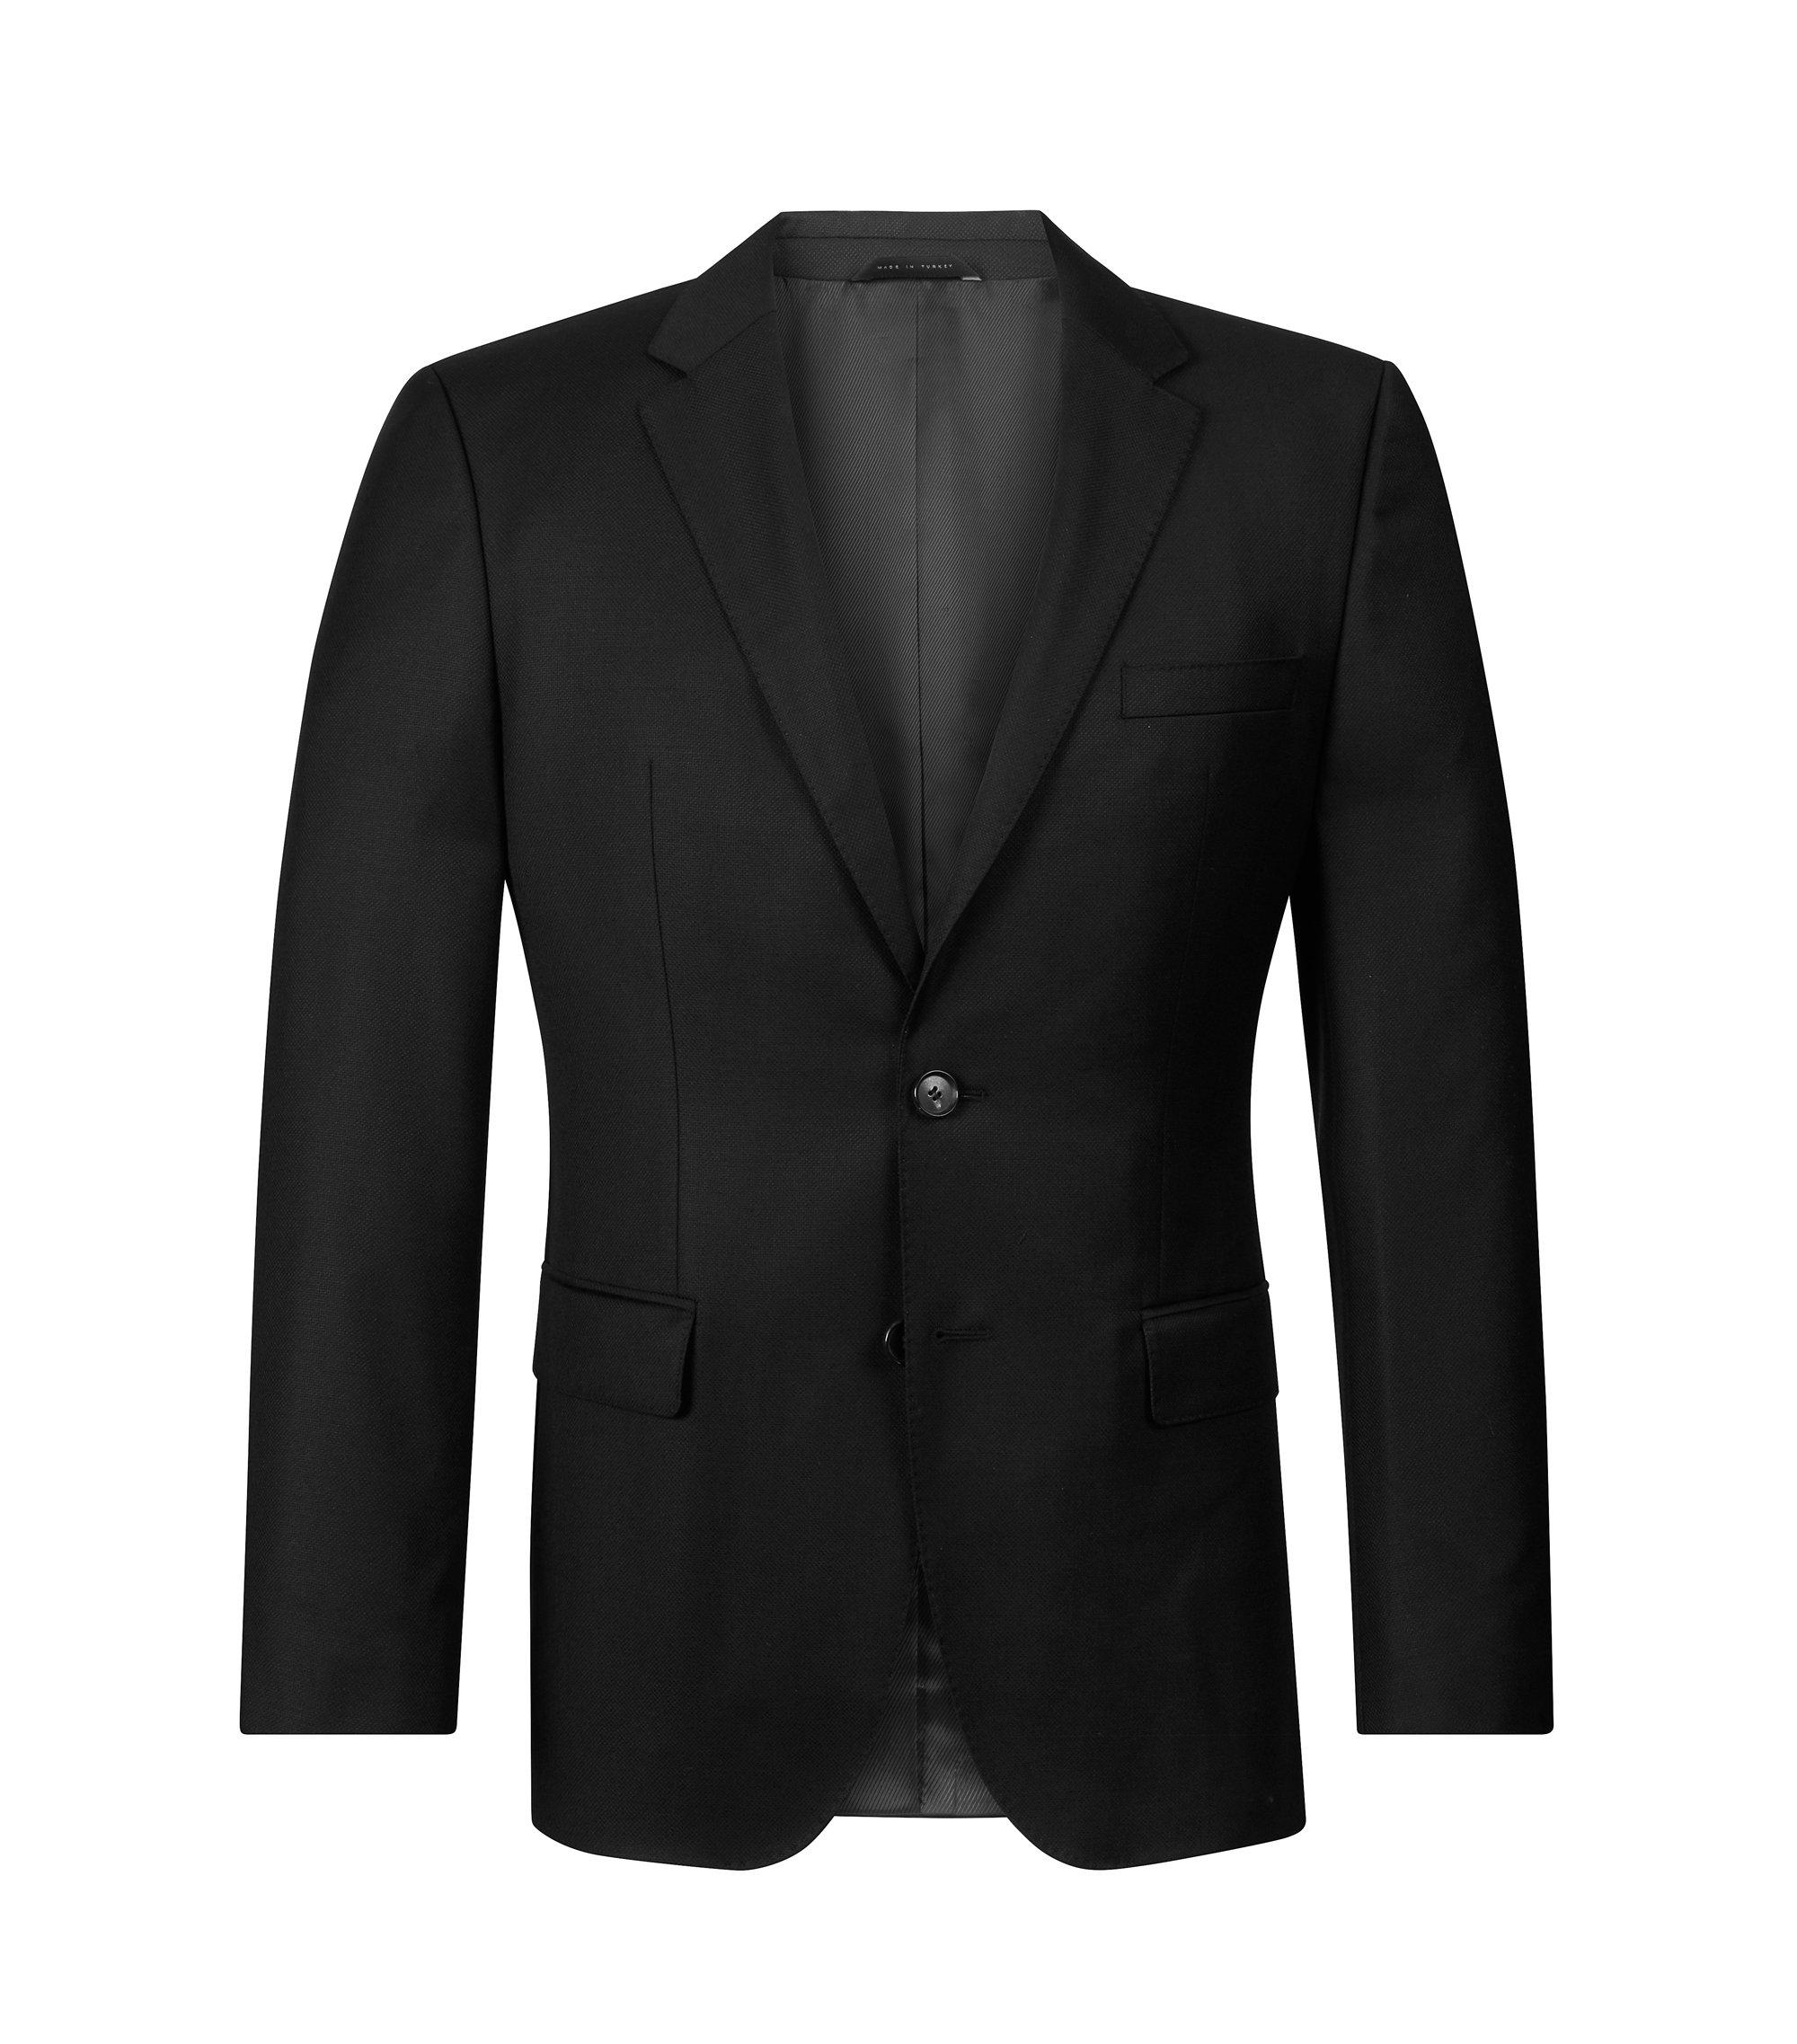 Virgin Wool Sport Coat, Regular Fit   The James, Black